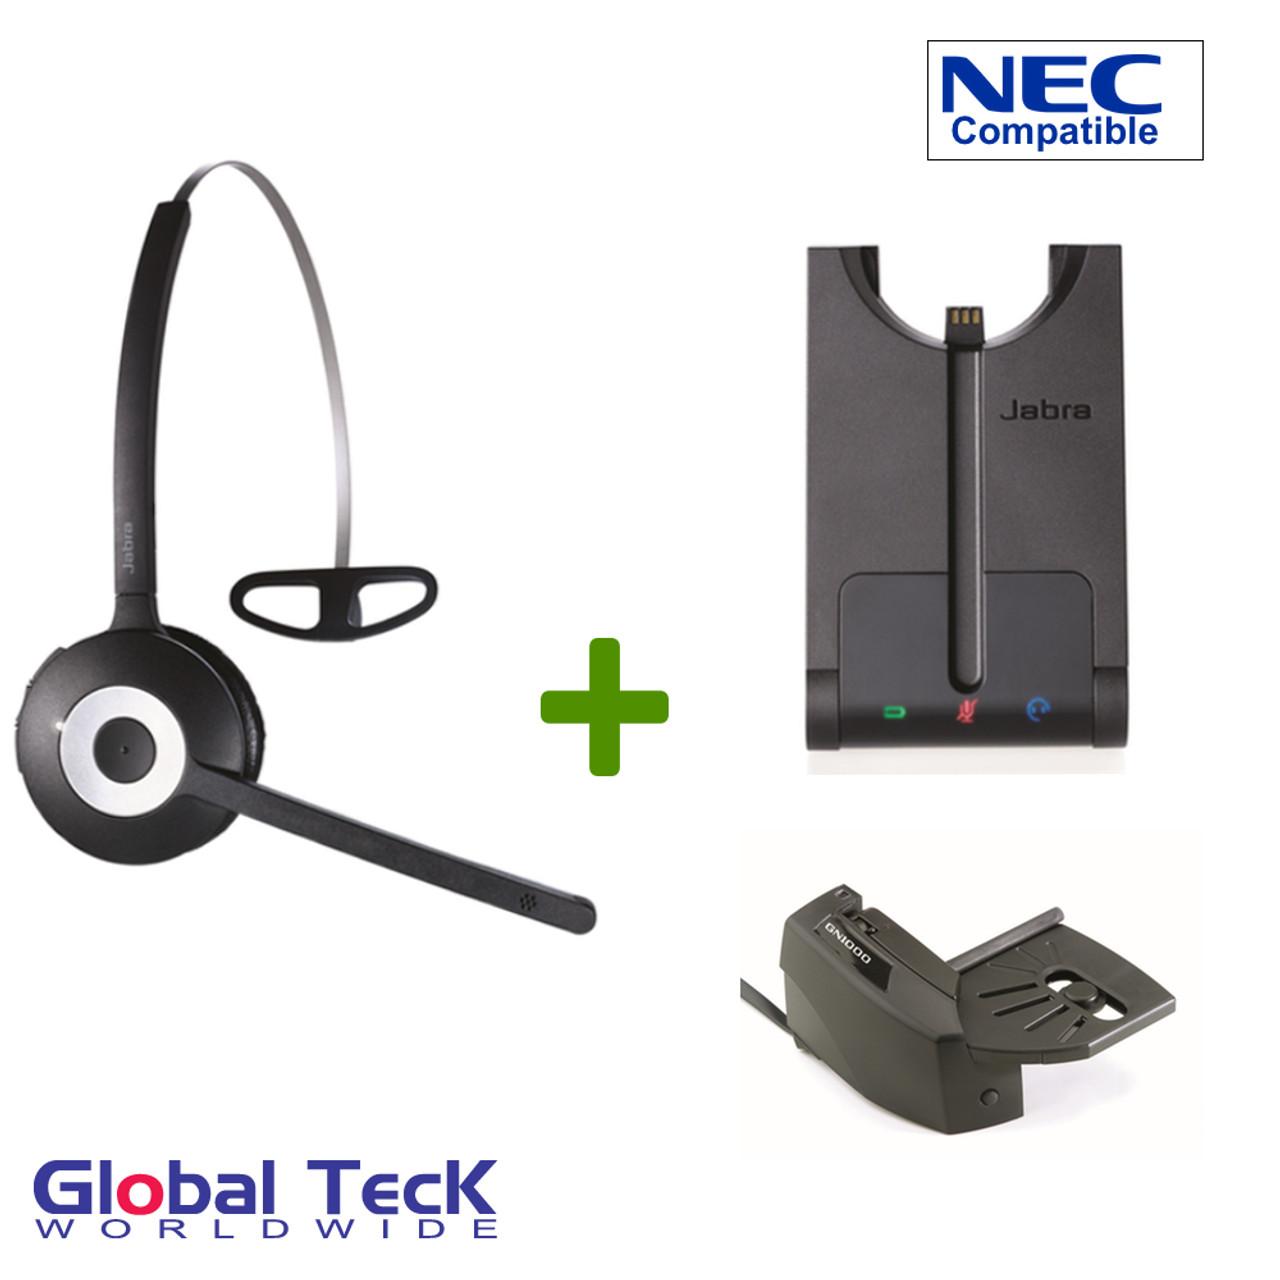 Jabra Pro 920 Bundles Wireless Headset System Includes Gn1000 Lifter 920 65 508 105 Nec Phones Console Elite Mark Dterm Itl Dt300 Dt700